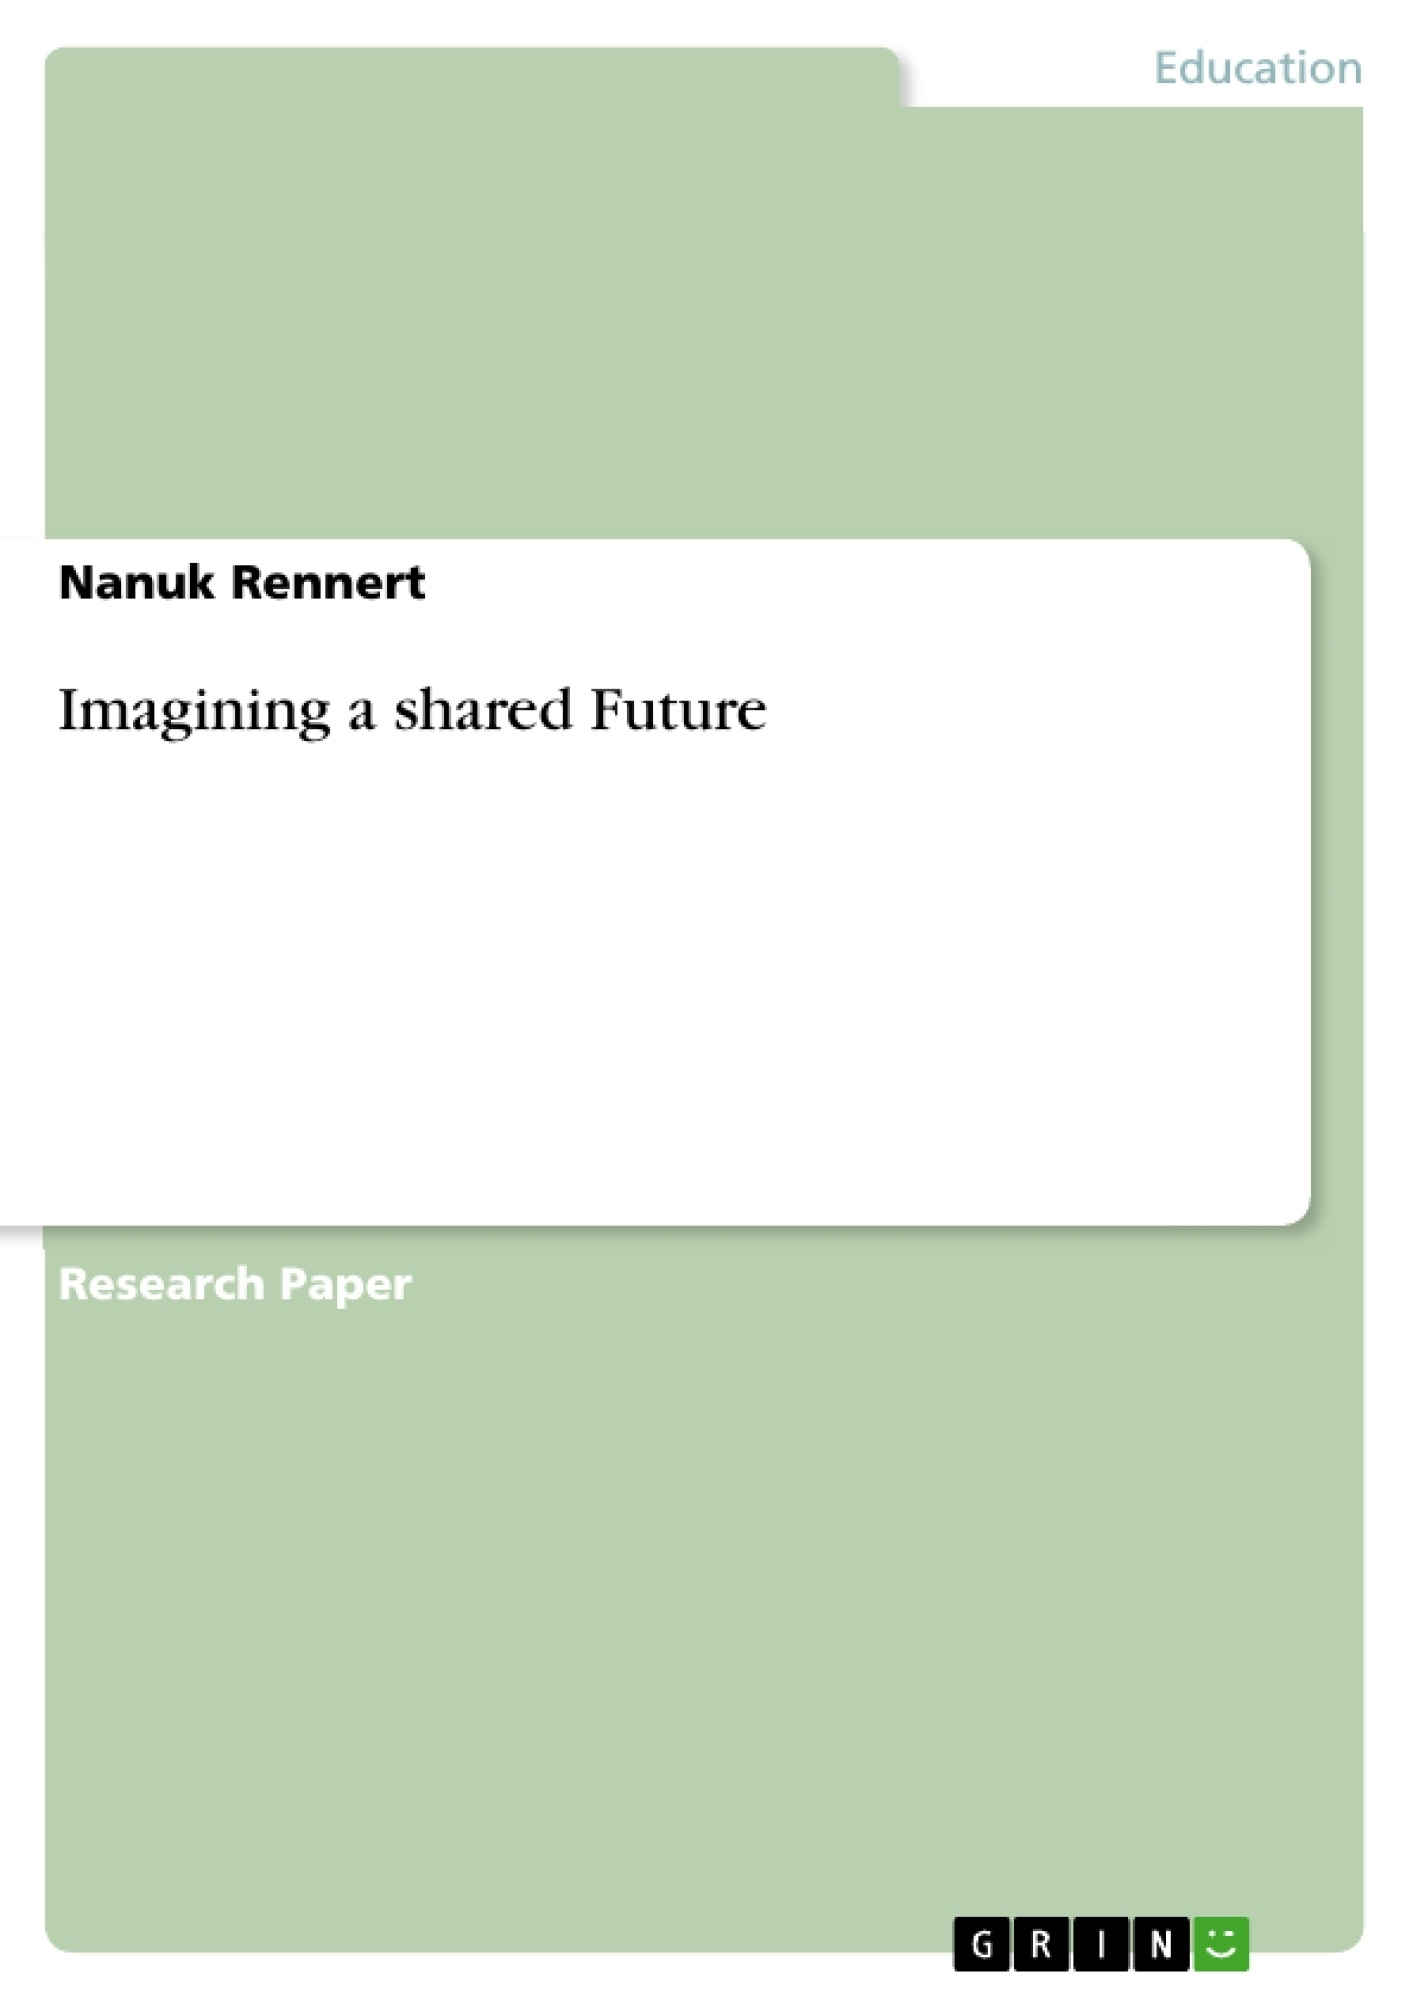 Imagining a shared Future